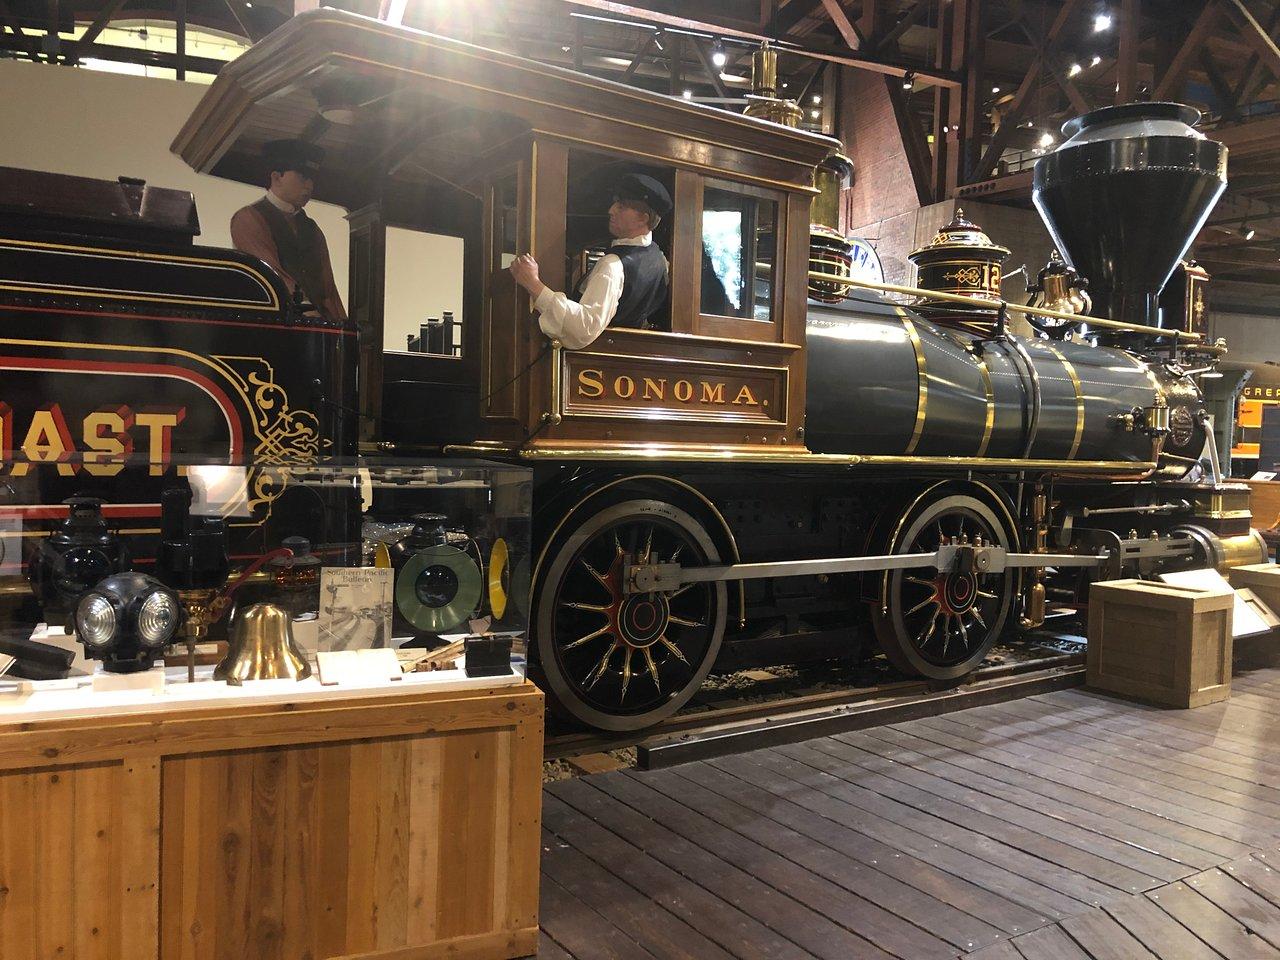 Railway Trains Traveller by Steam Locomotive Adult /& Kids T-Shirt